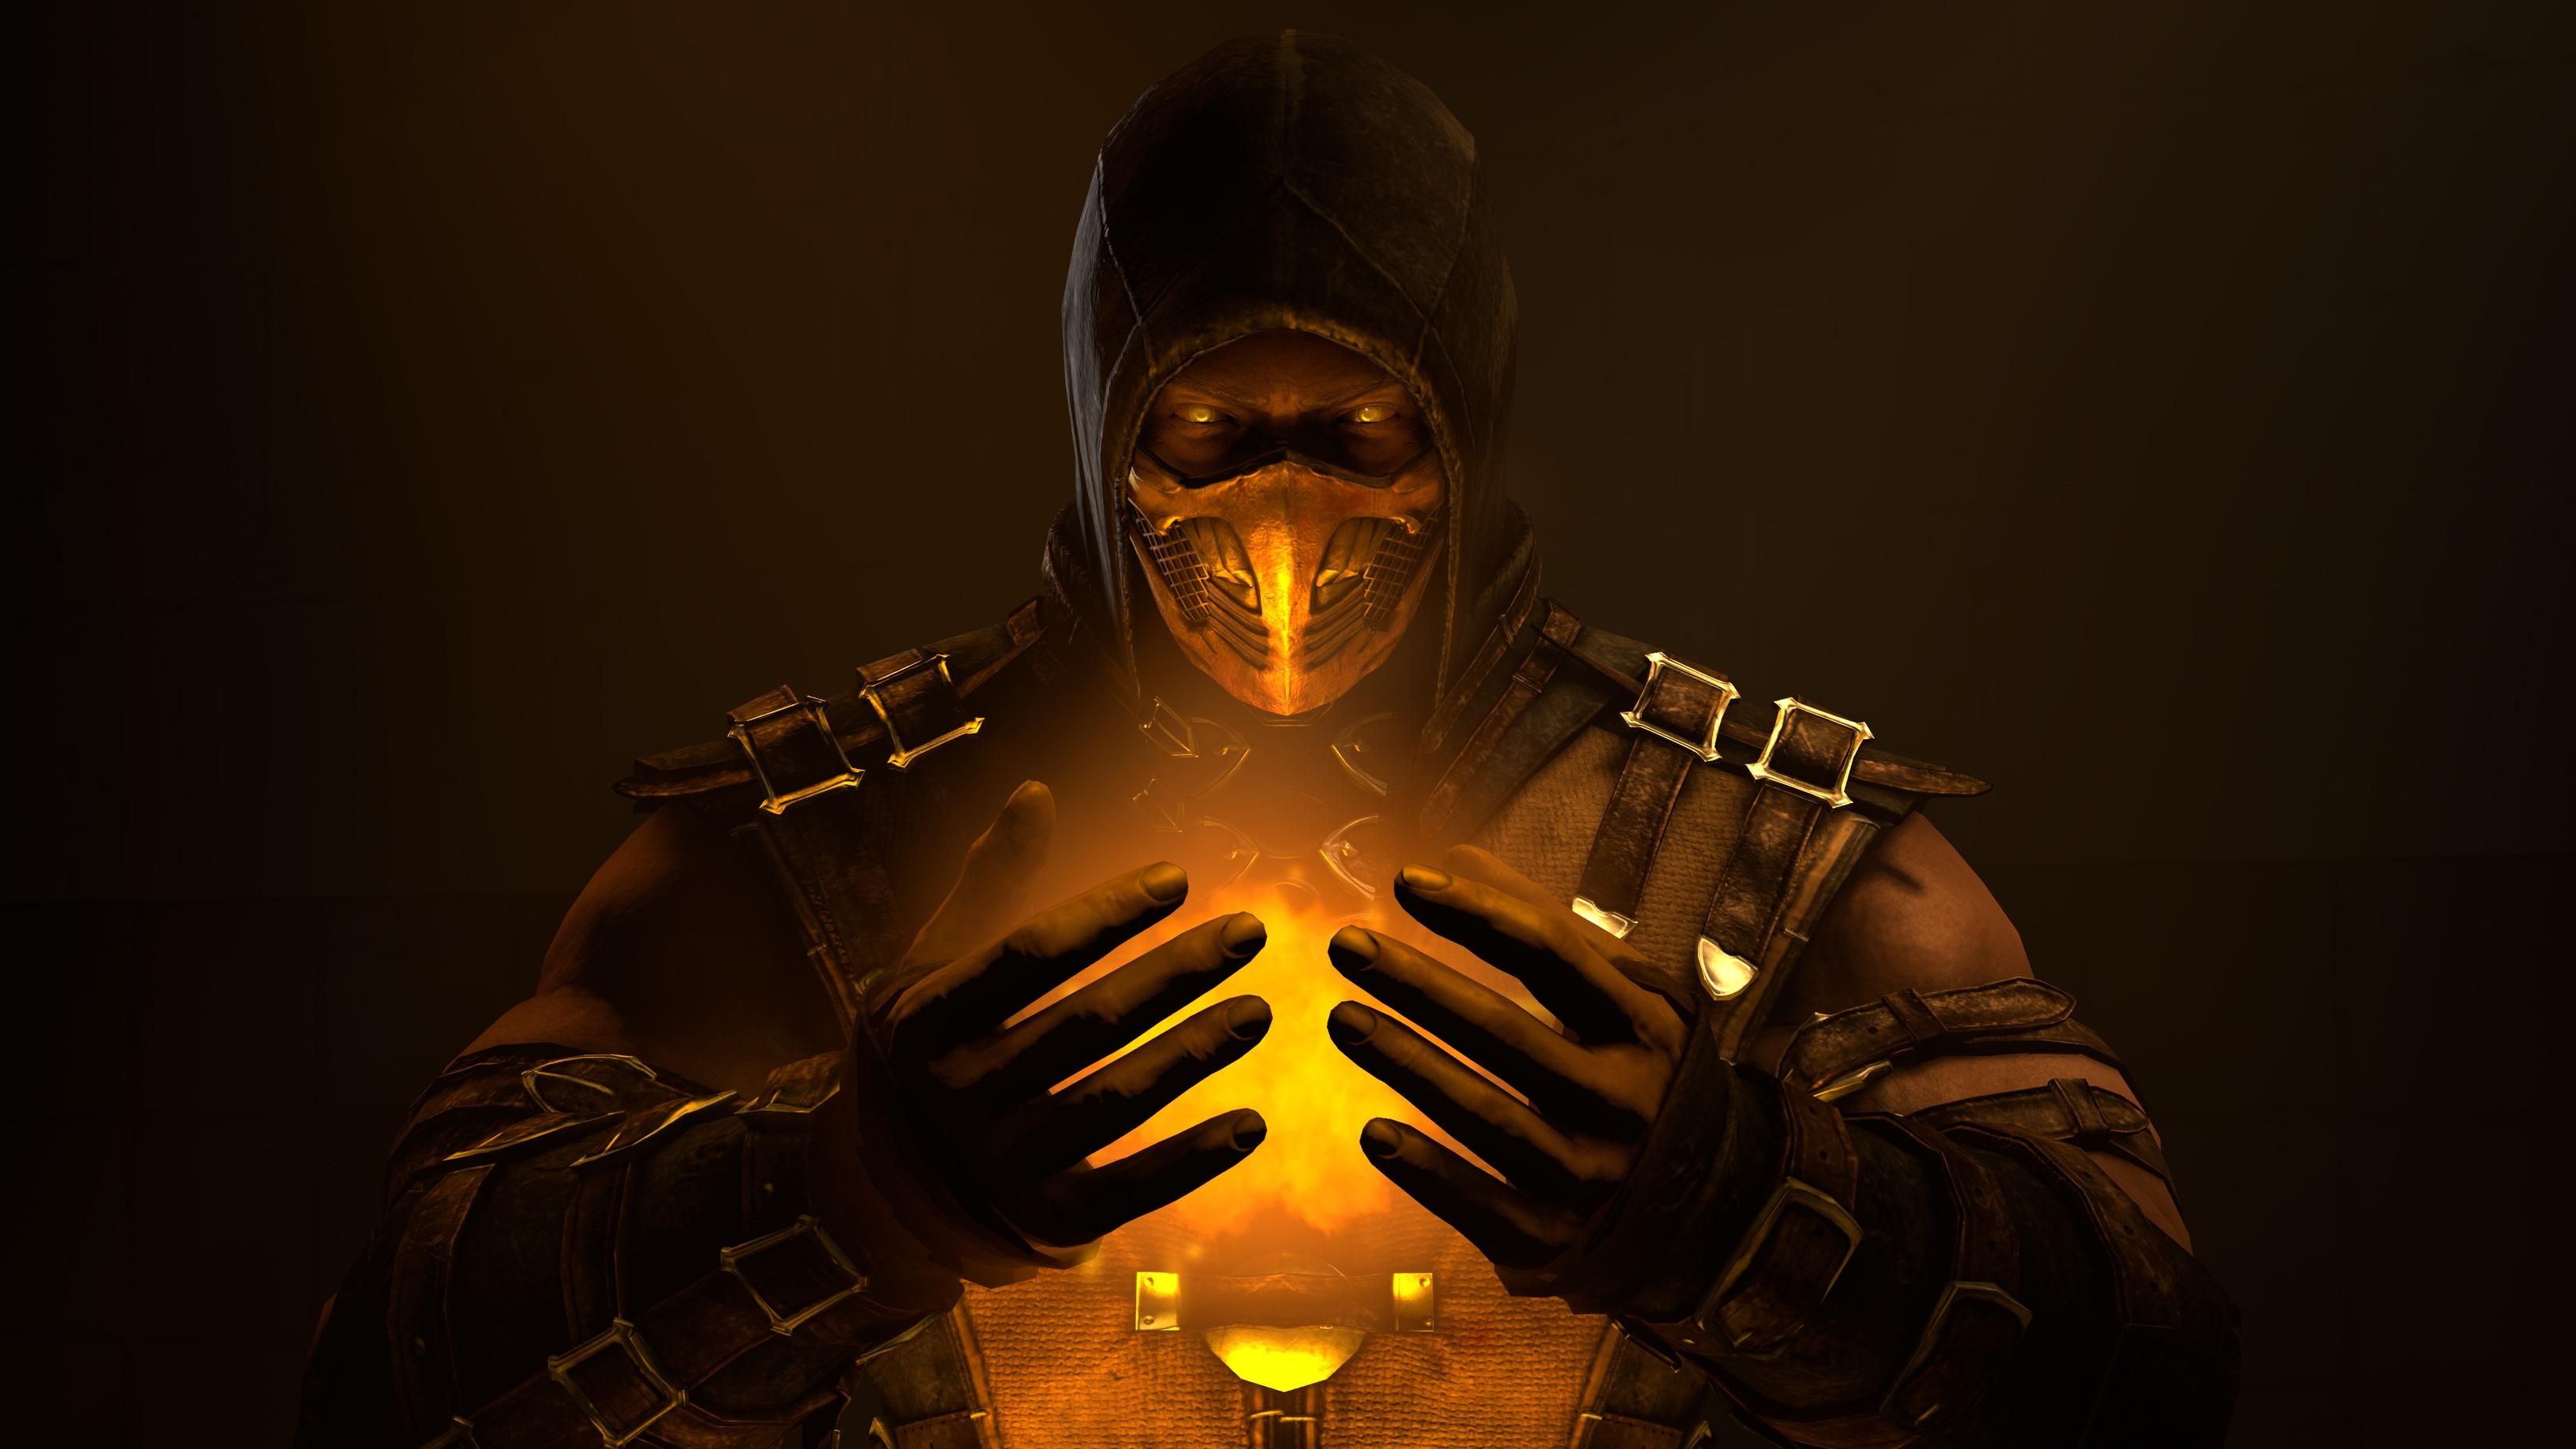 Wallpaper Mortal Kombat 11 Video Games 3265x1837 Quanleloi